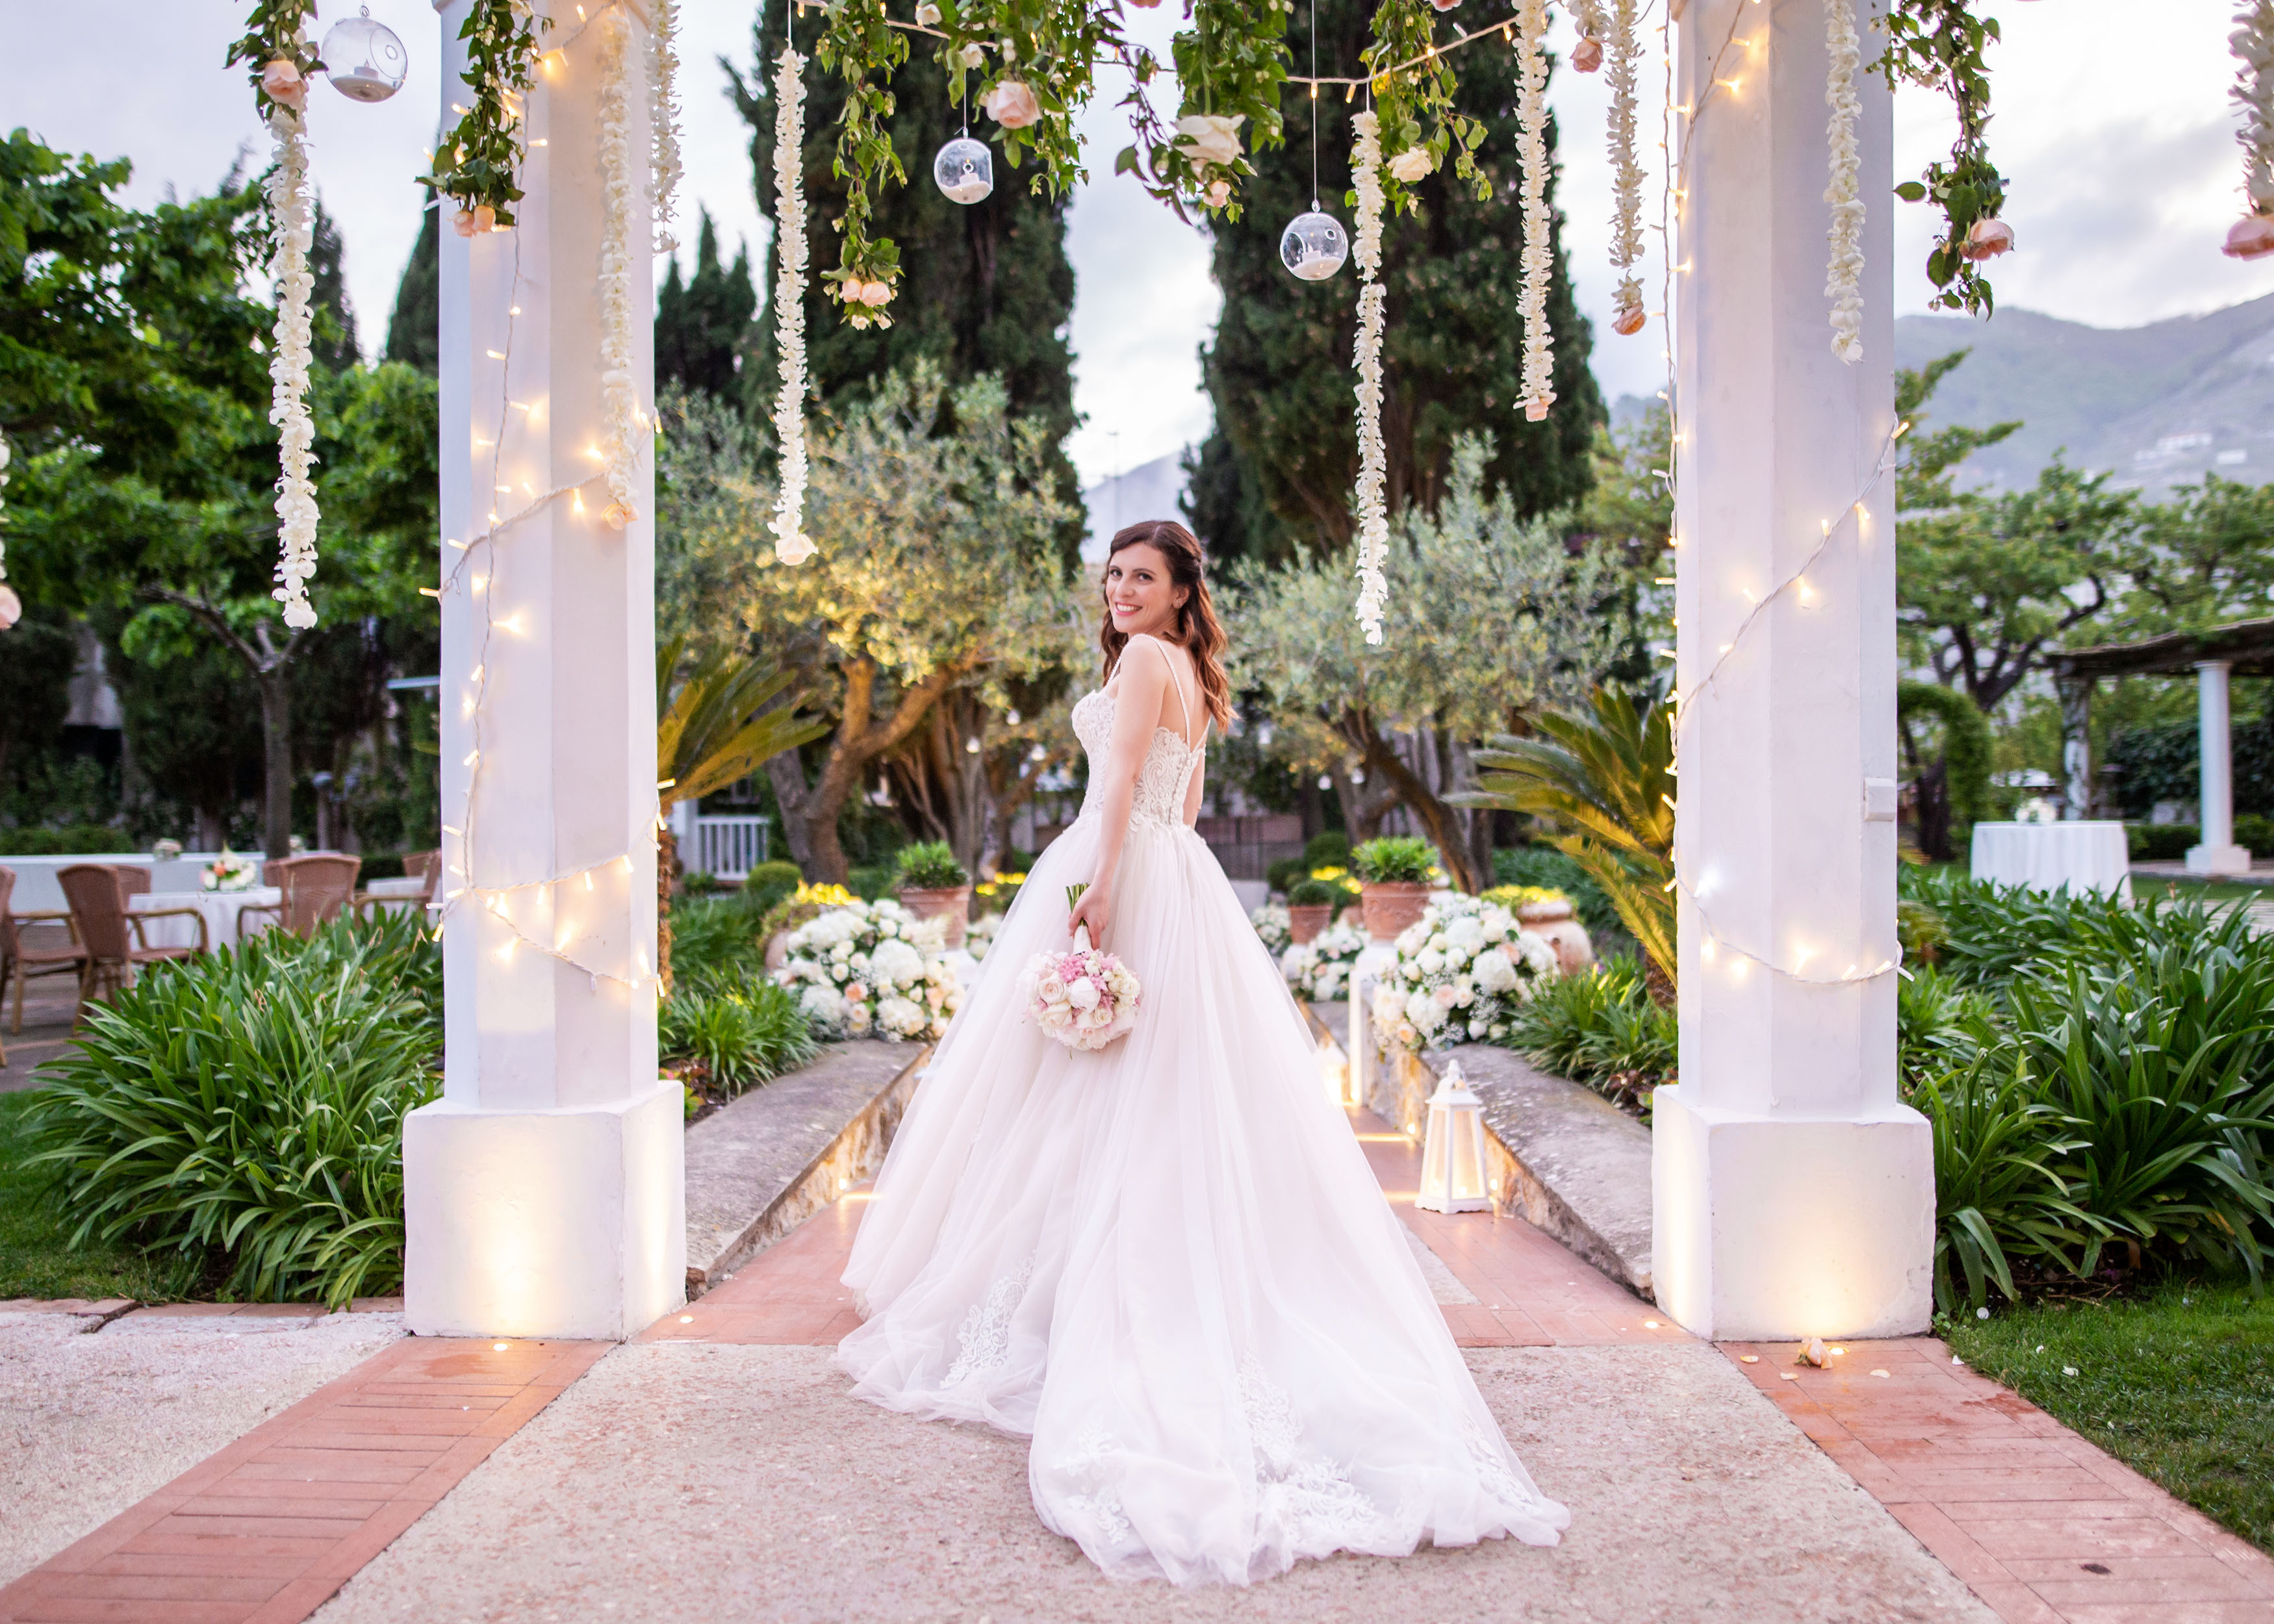 http://www.weddingamalfi.com/wp-content/uploads/Katia-Jorge-18-maggio-2019-40.jpg